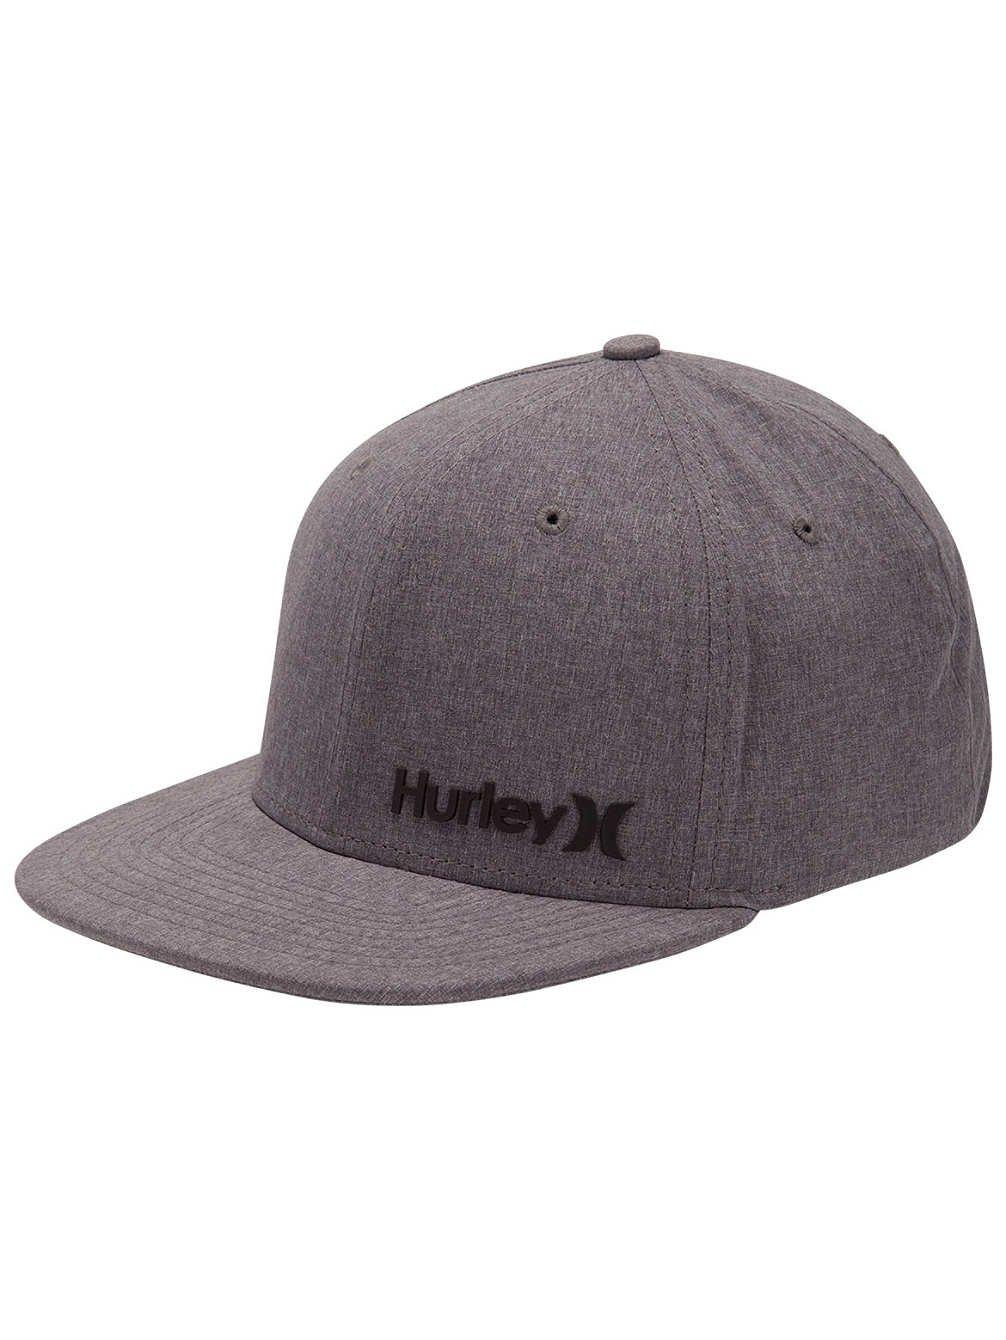 Hurley Mens Phantom Corp Cap OS Black